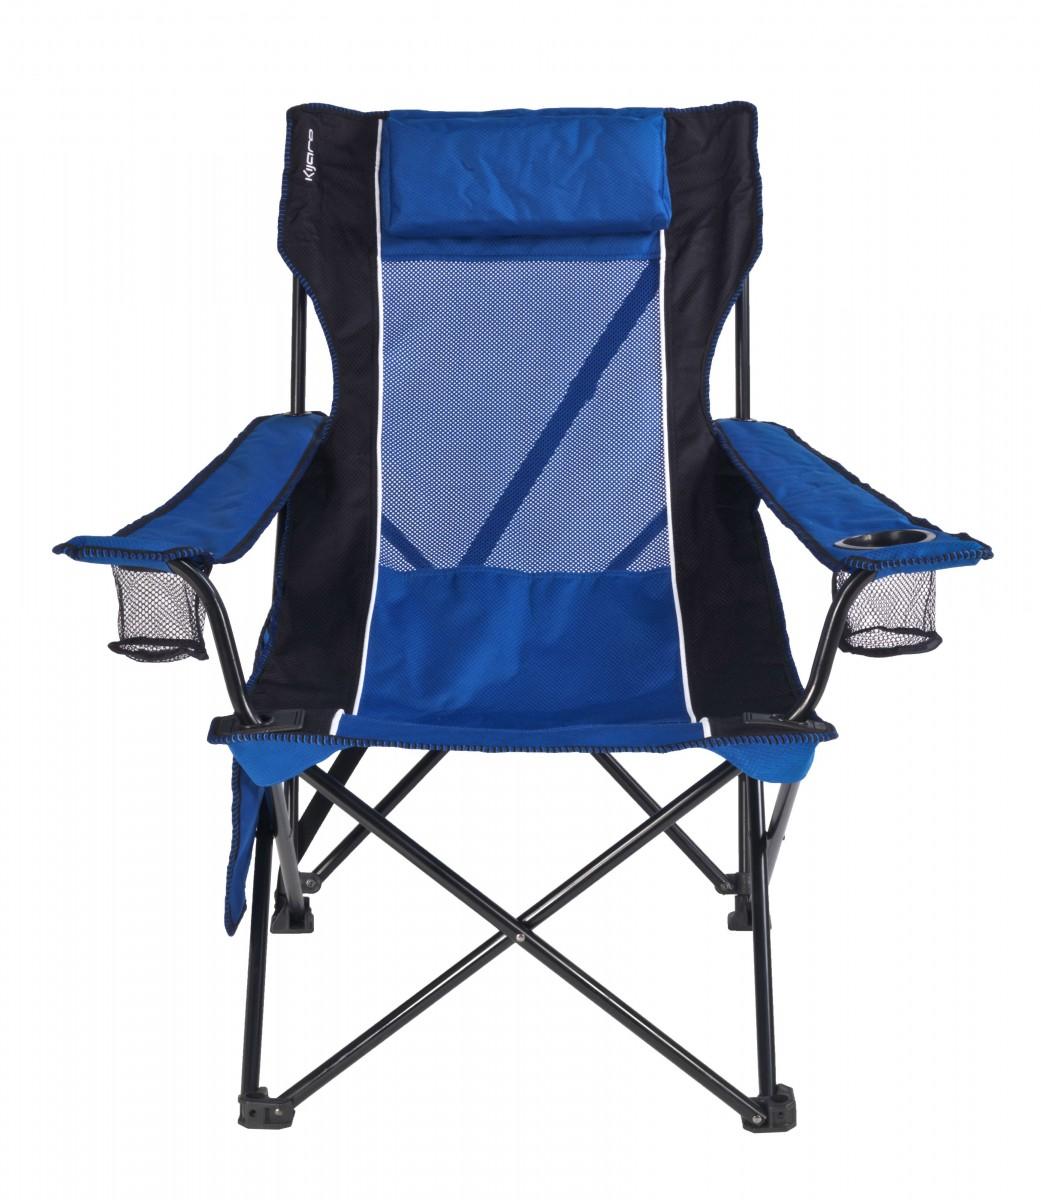 Kijaro Maldives Blue Sling Chair